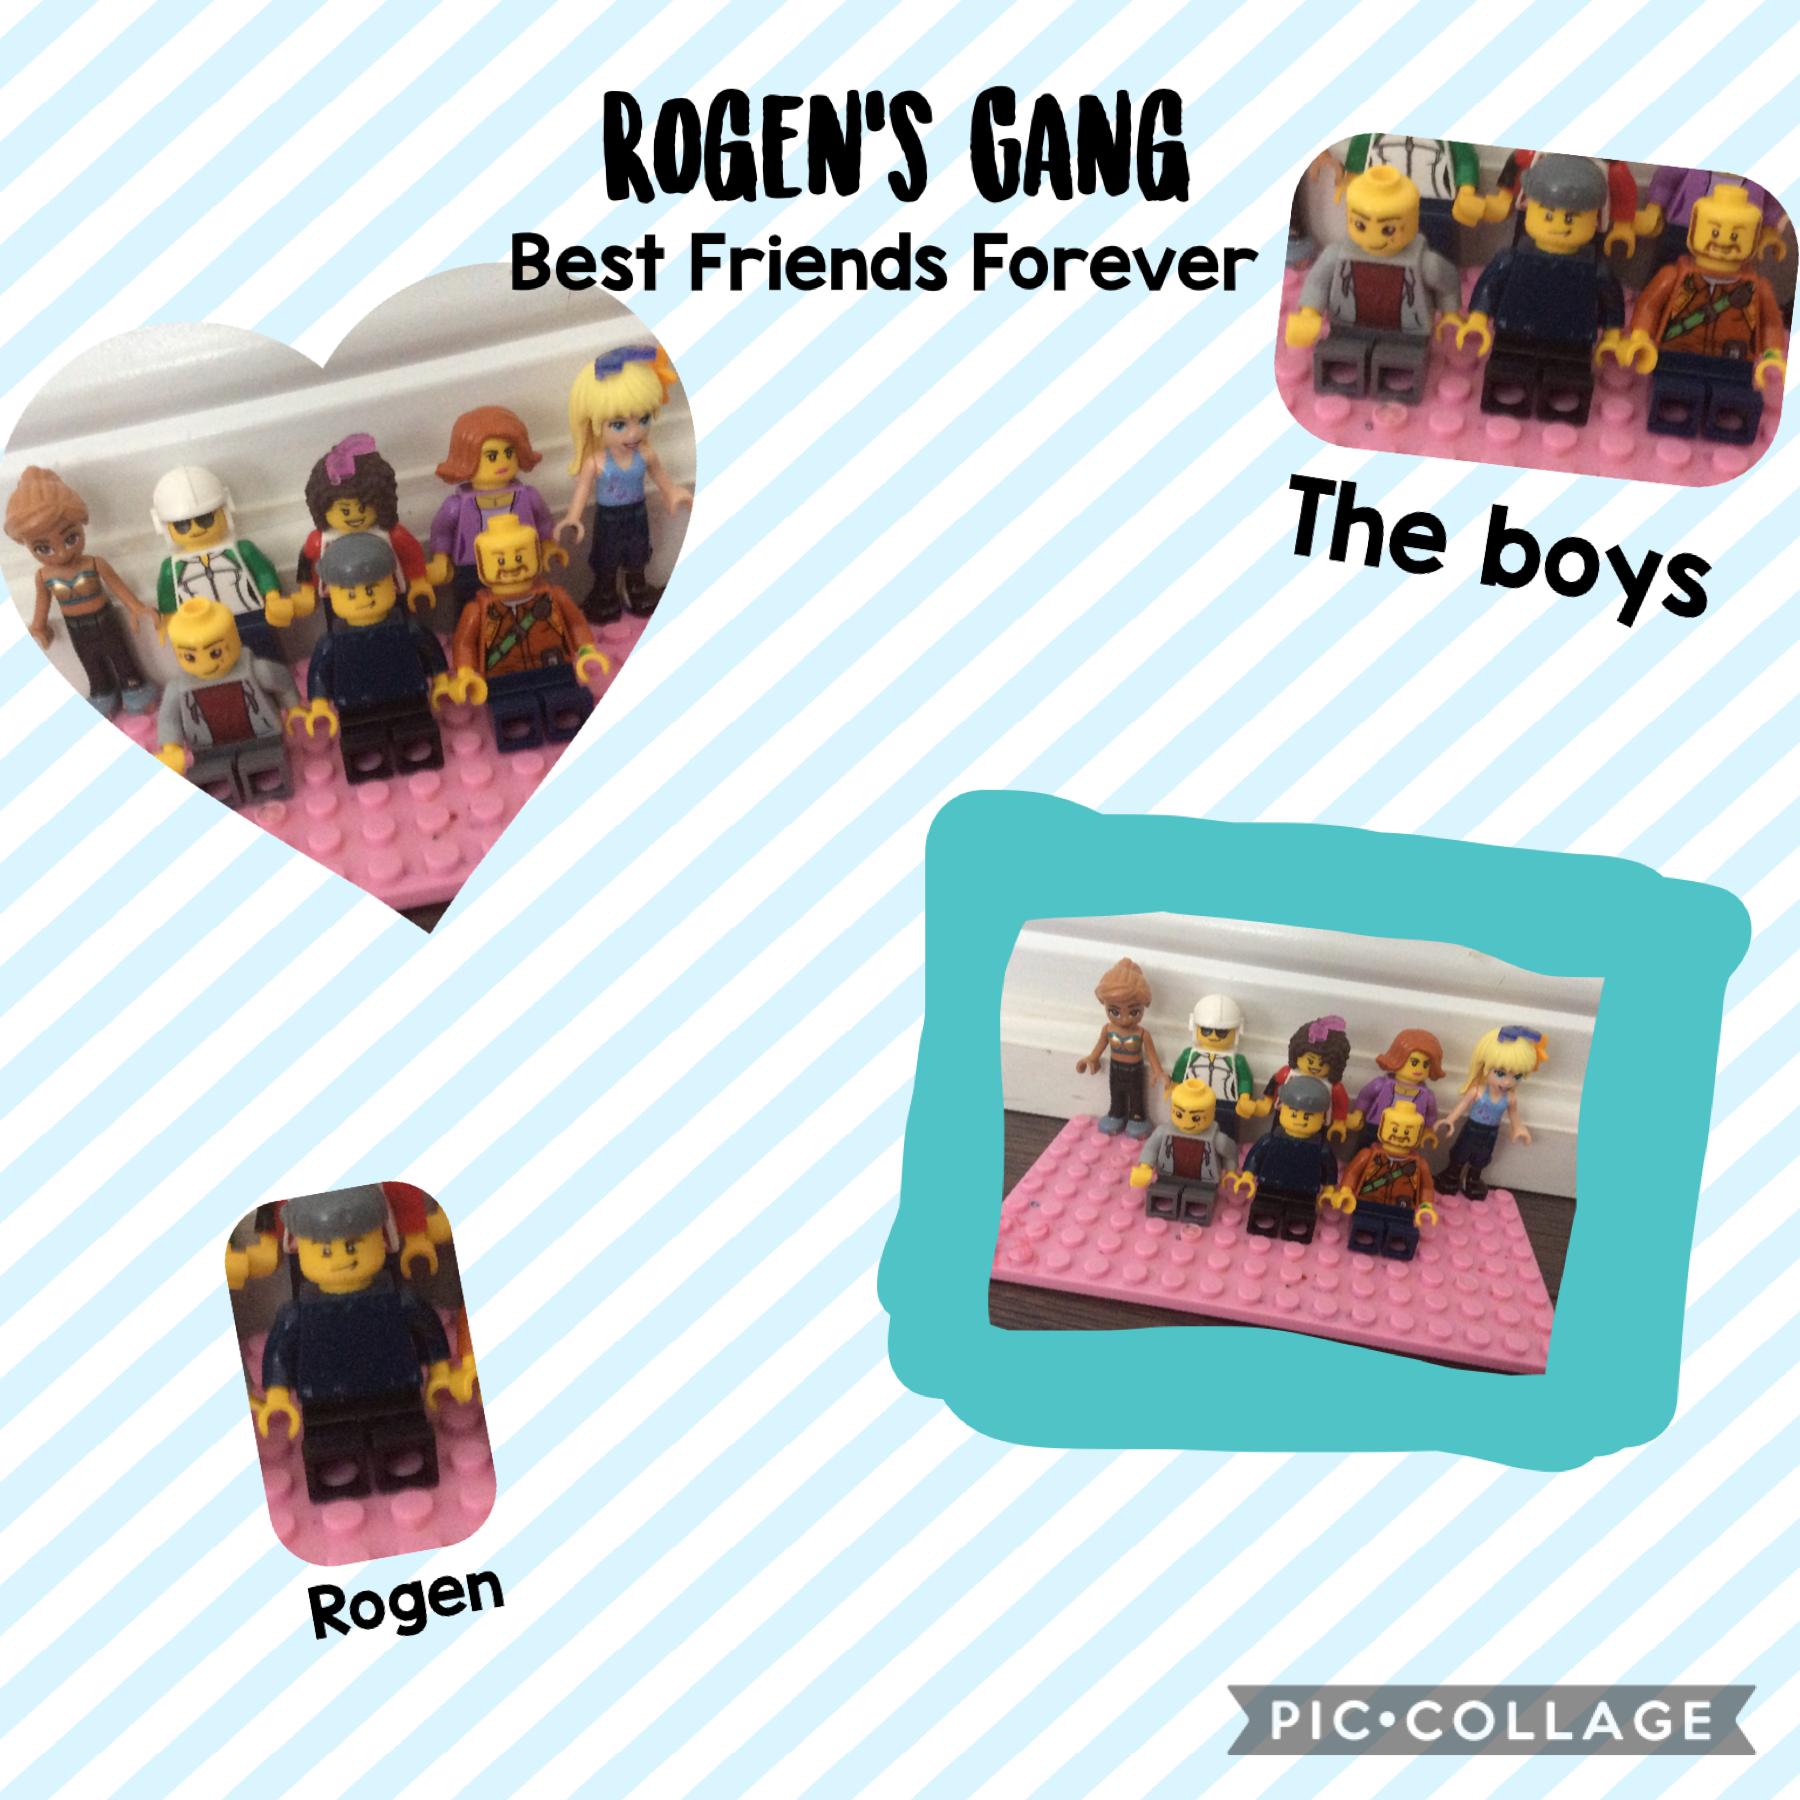 My fav LEGO figures